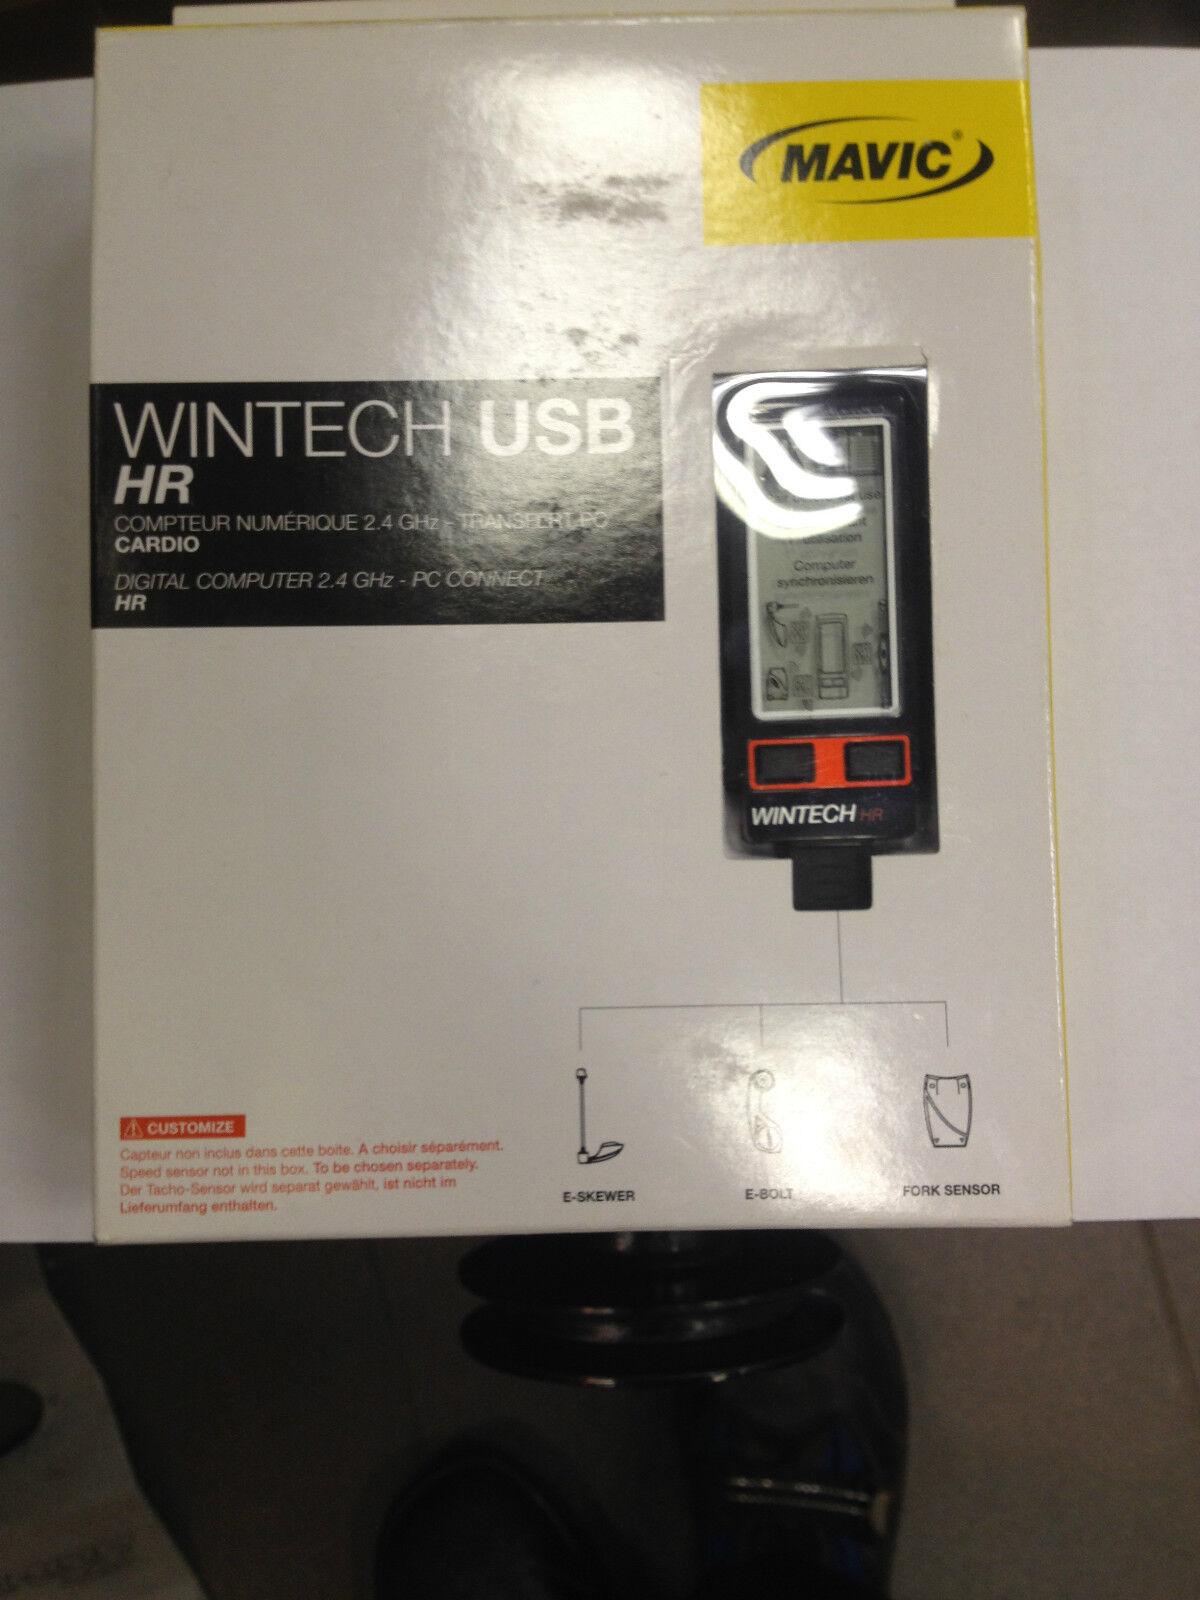 Mavic wintech USB HR (11864801)